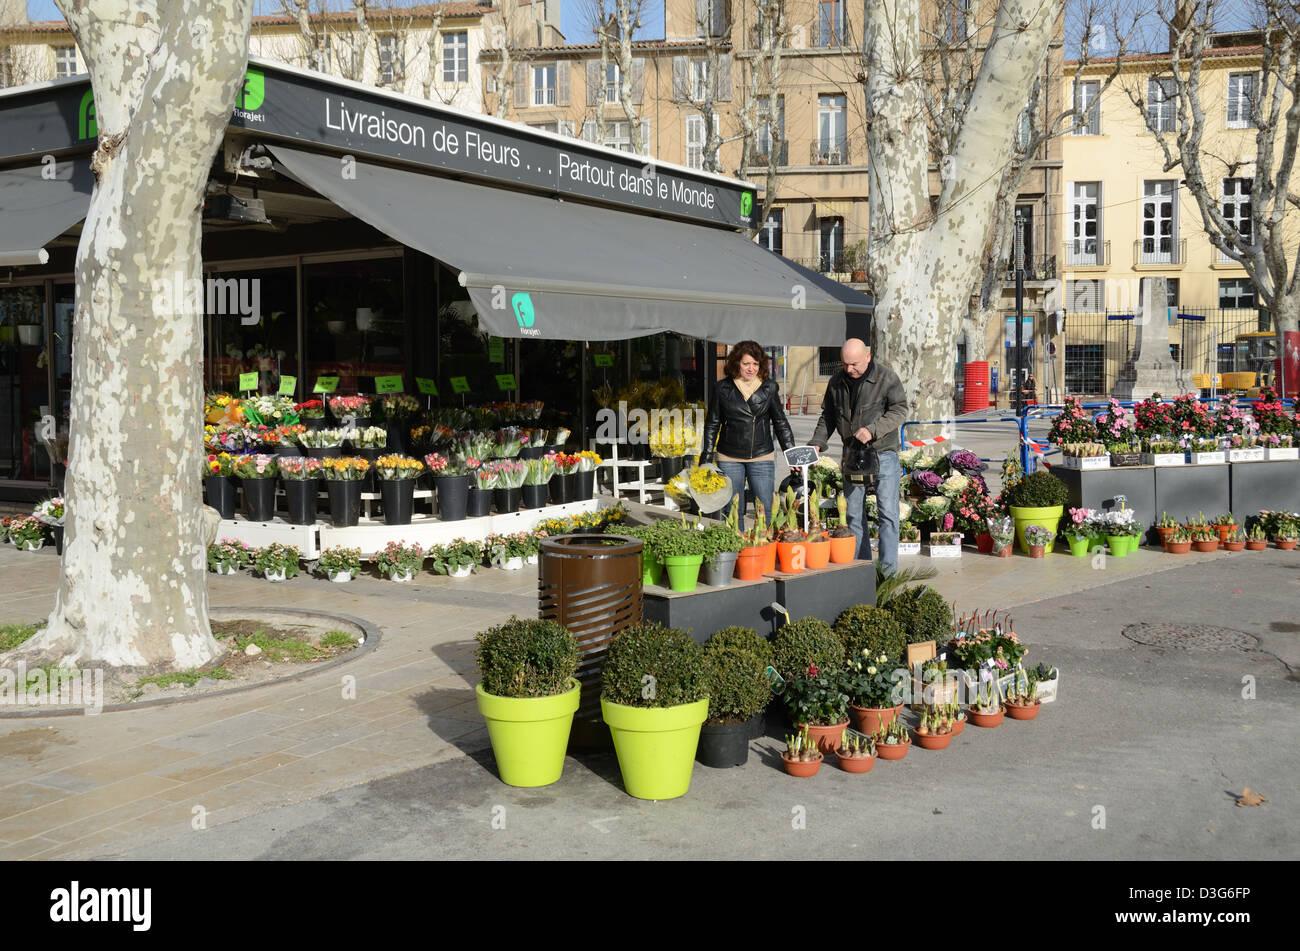 Florist or Florists Shop La Rotonde Aix-en-Provence France - Stock Image